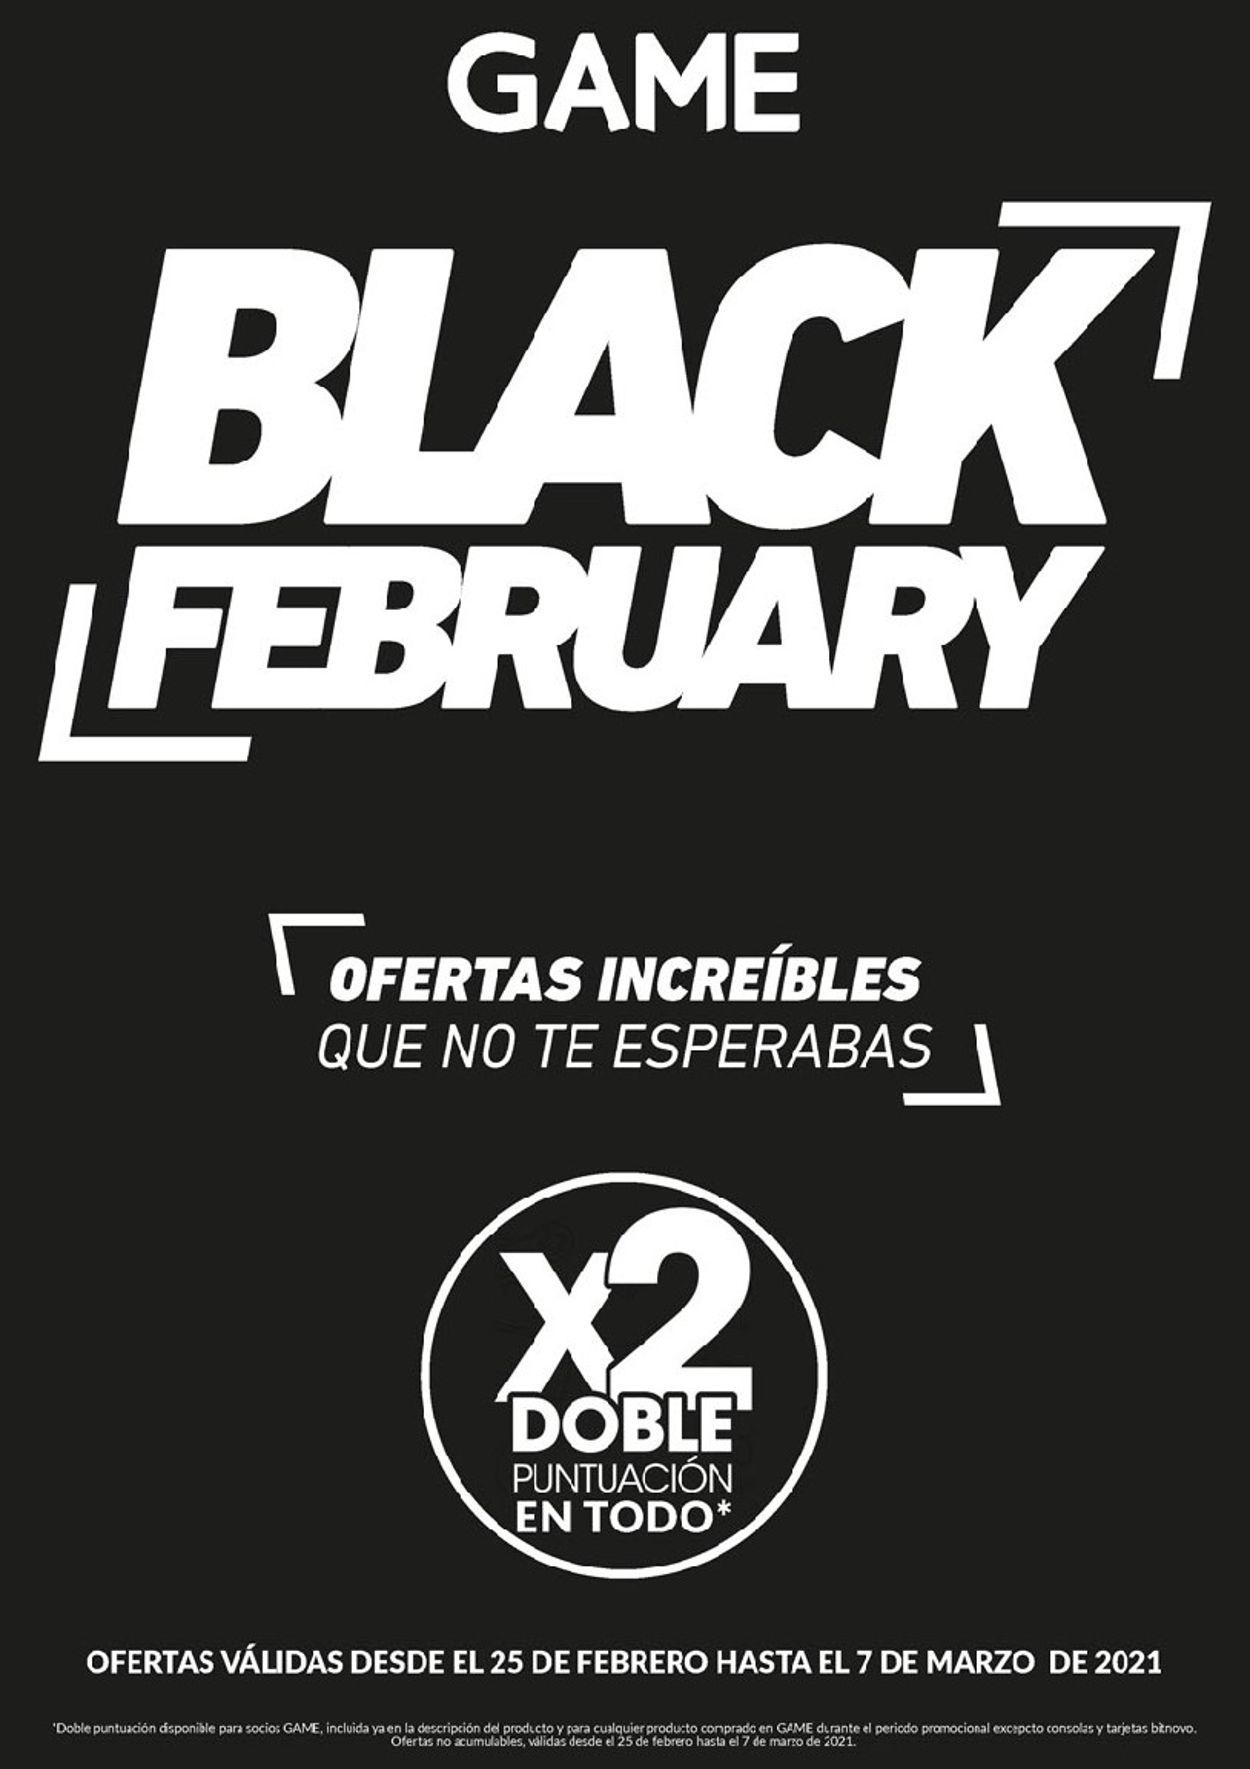 Game BLACK FEBRUARY Folleto - 25.02-07.03.2021